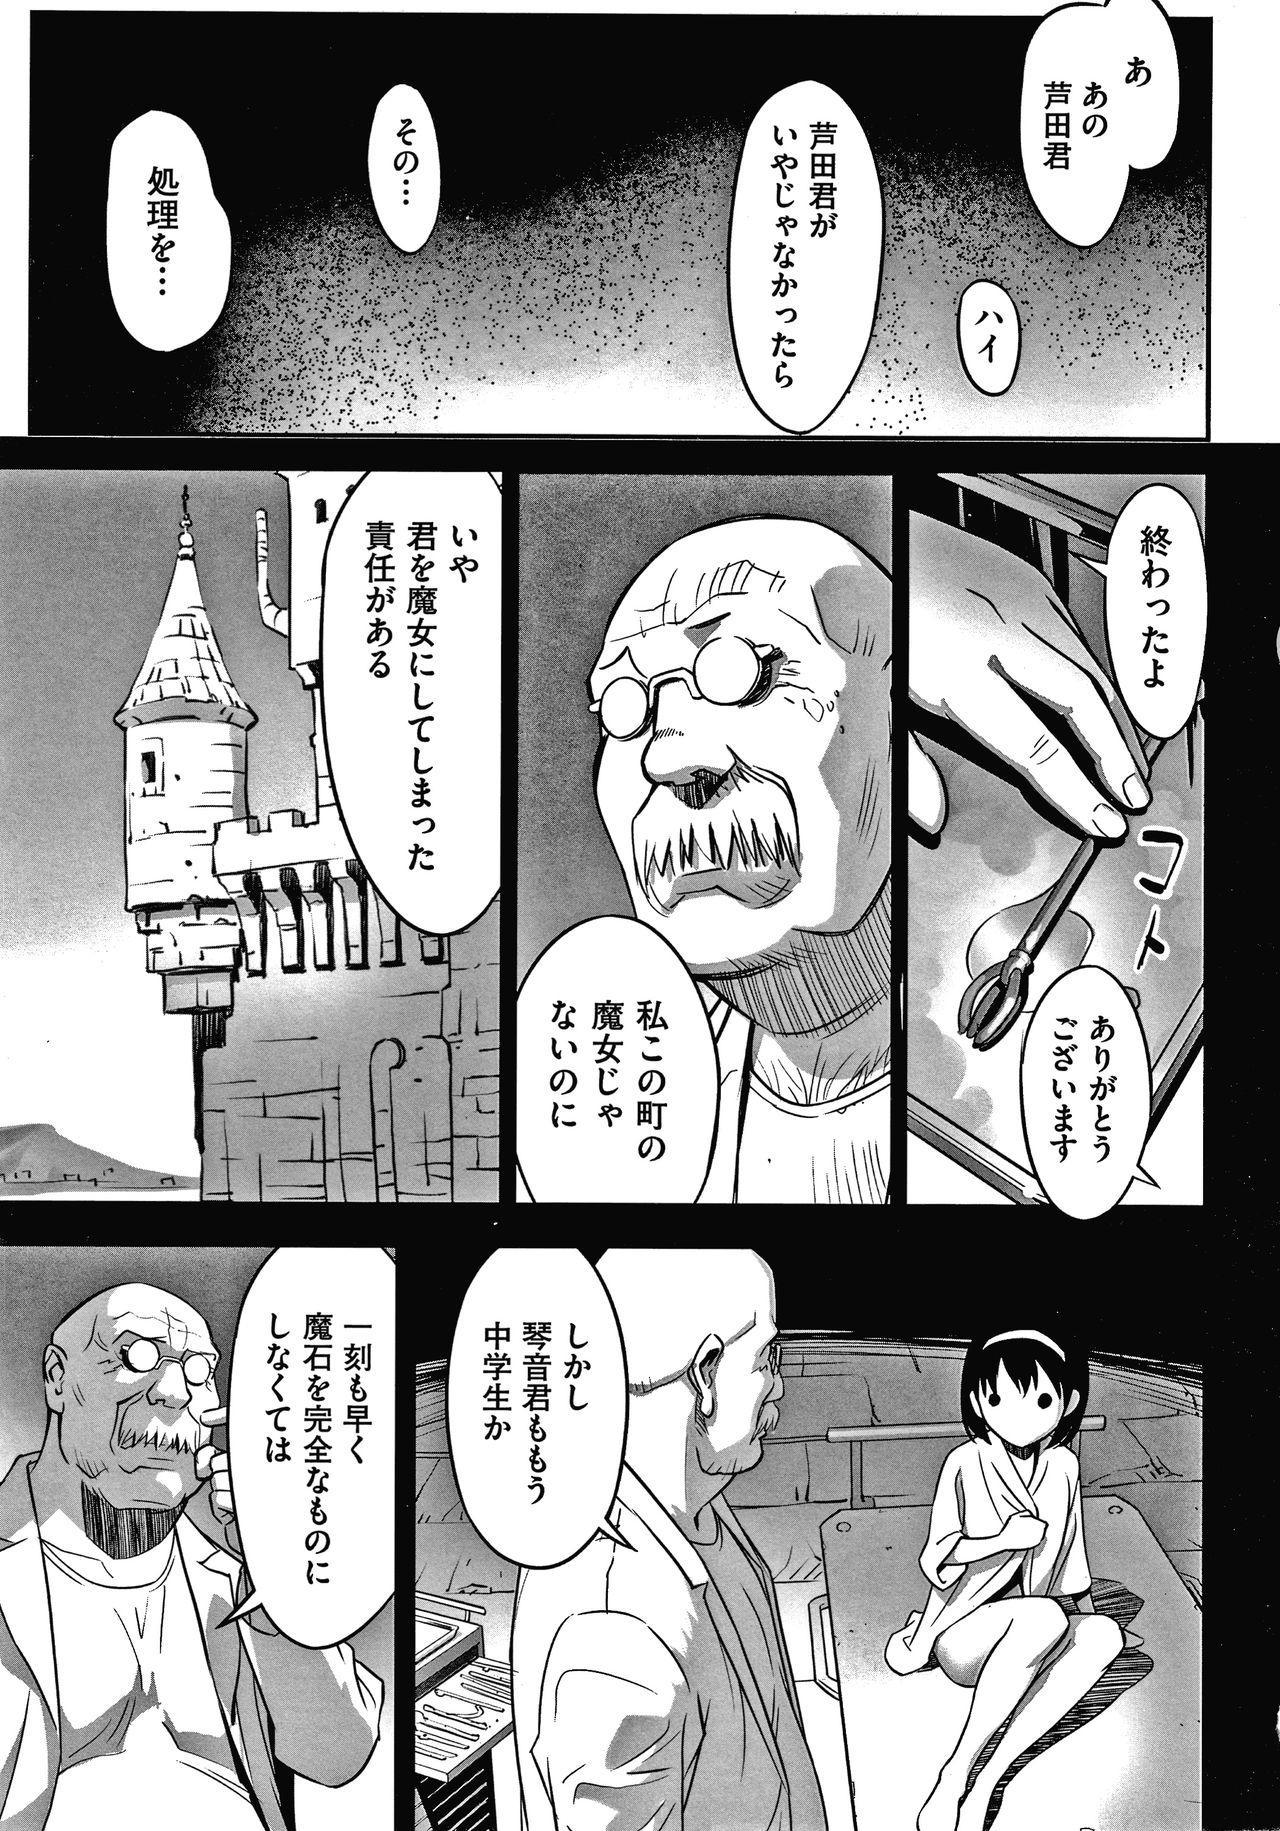 Shoujo Kumikyoku 15 115